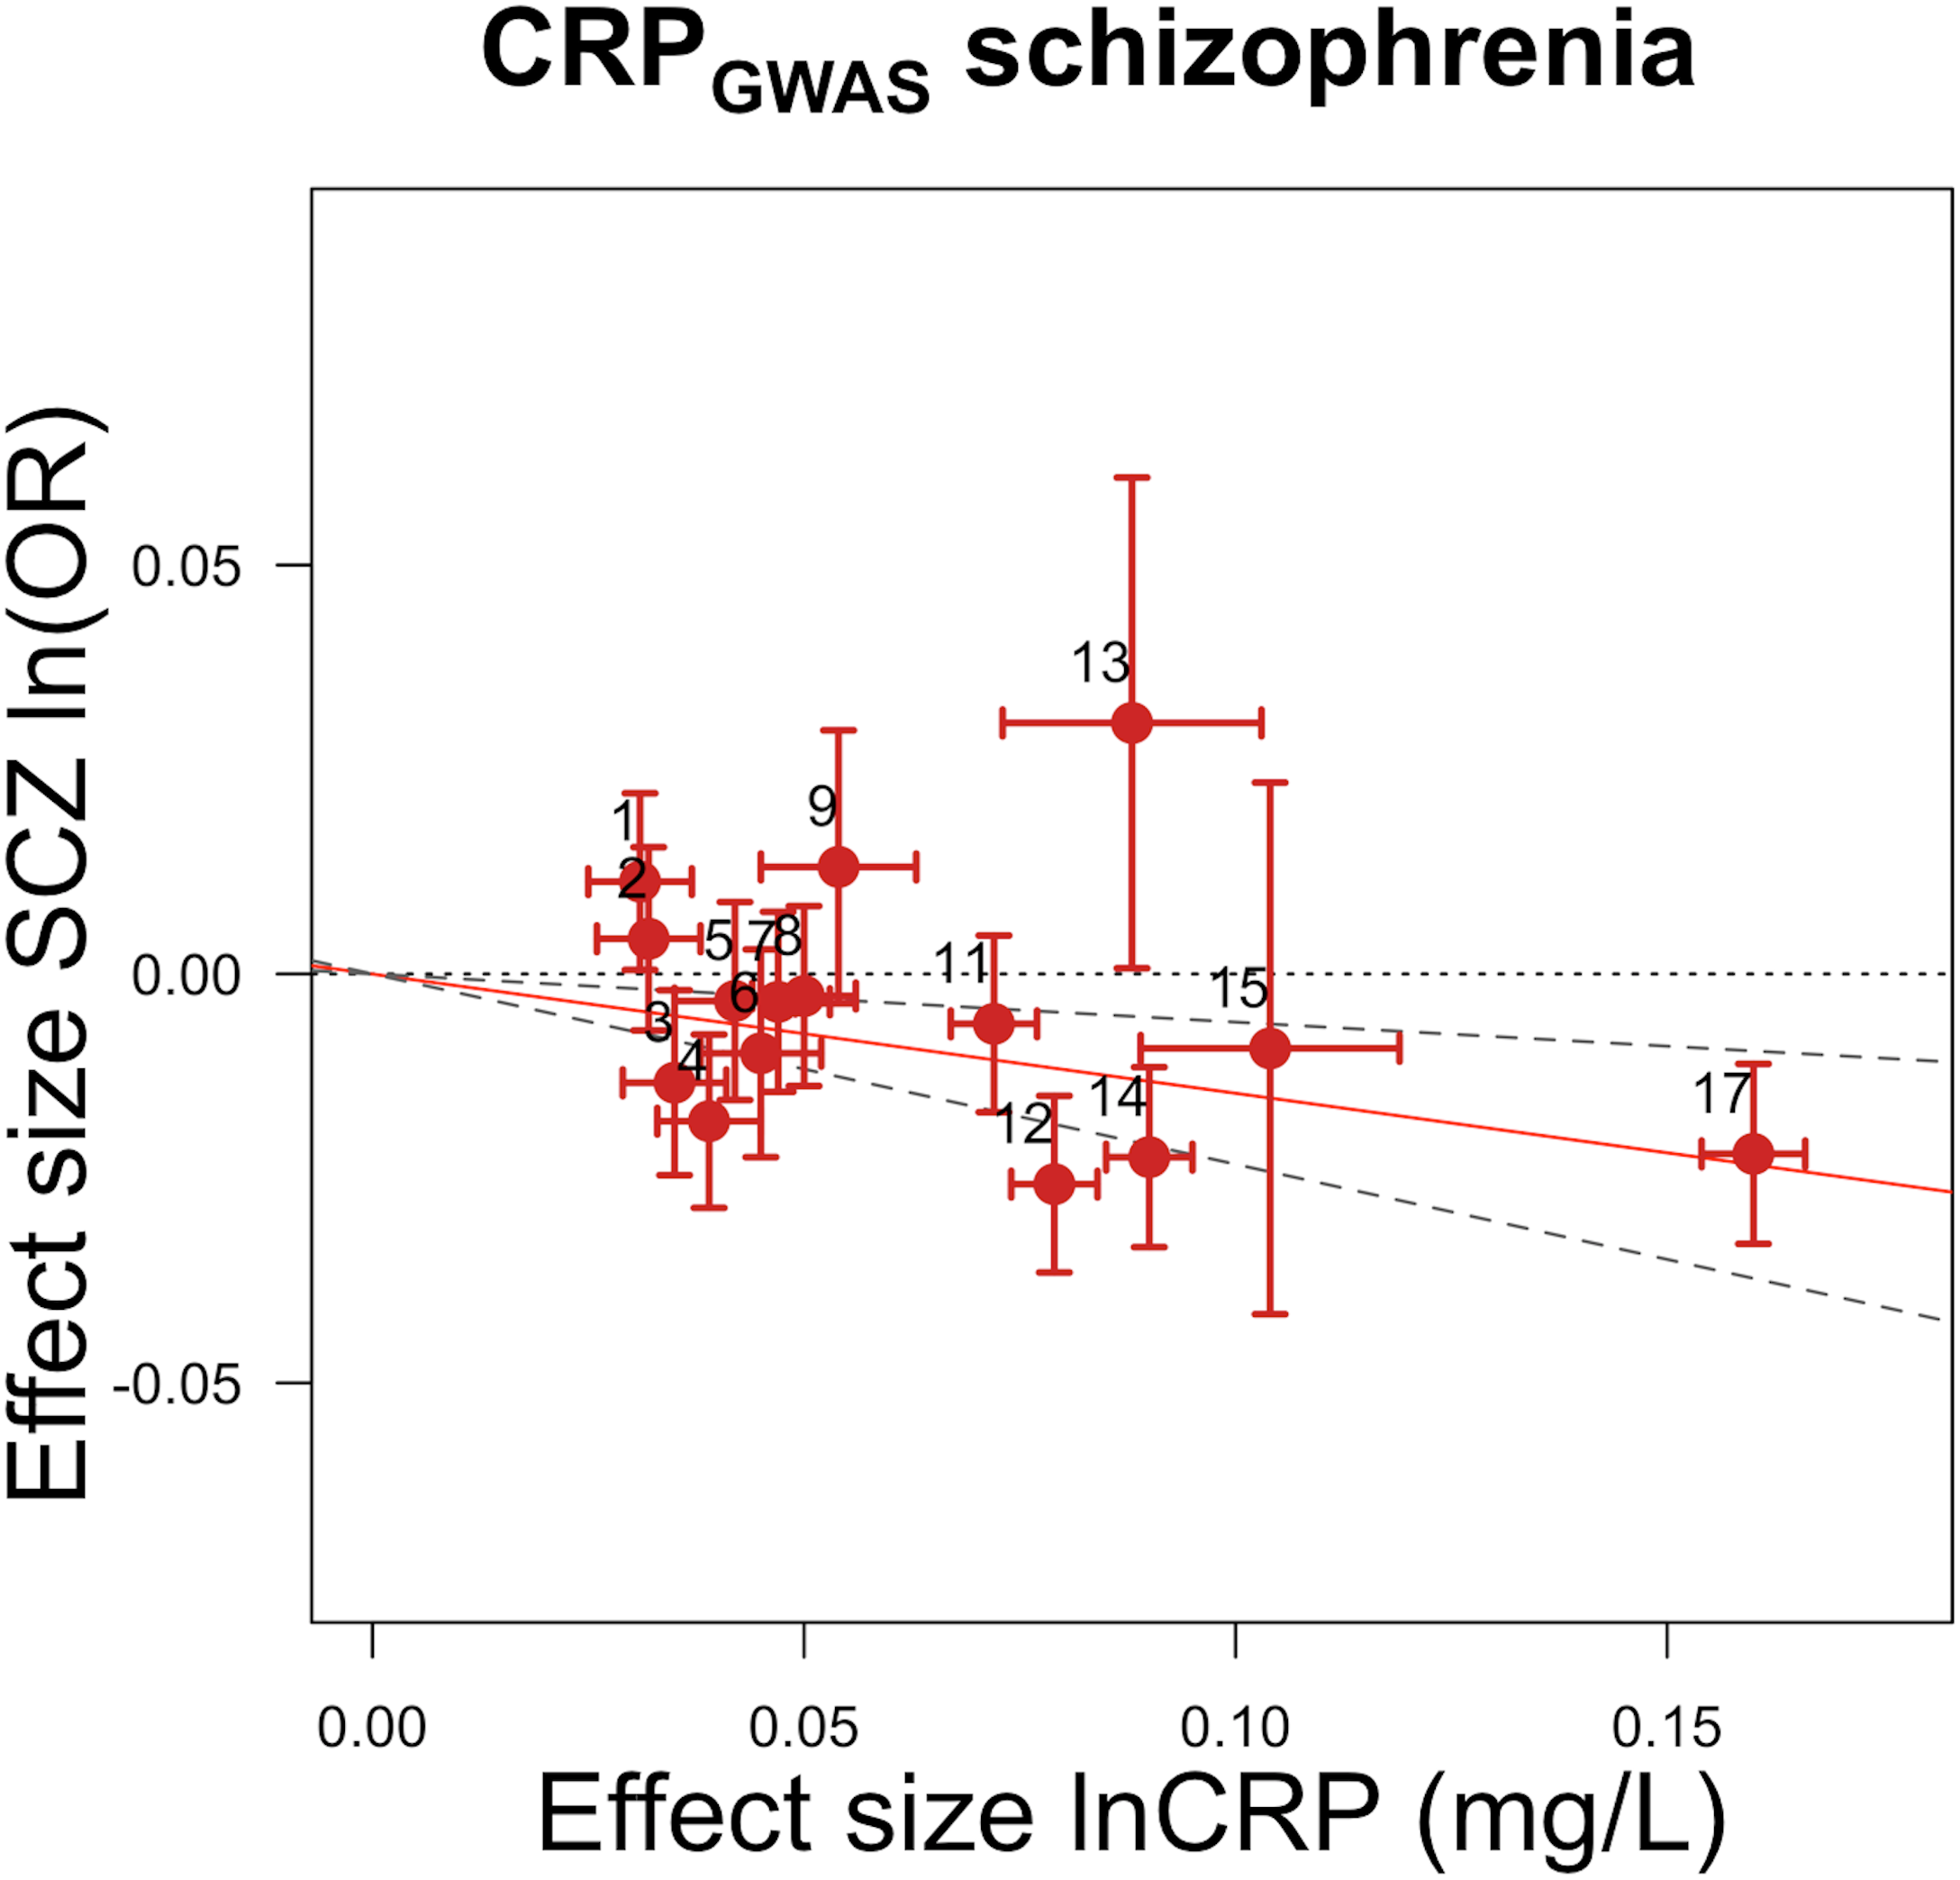 Genetic risk score GRS<sub><i>GWAS</i></sub> for schizophrenia.